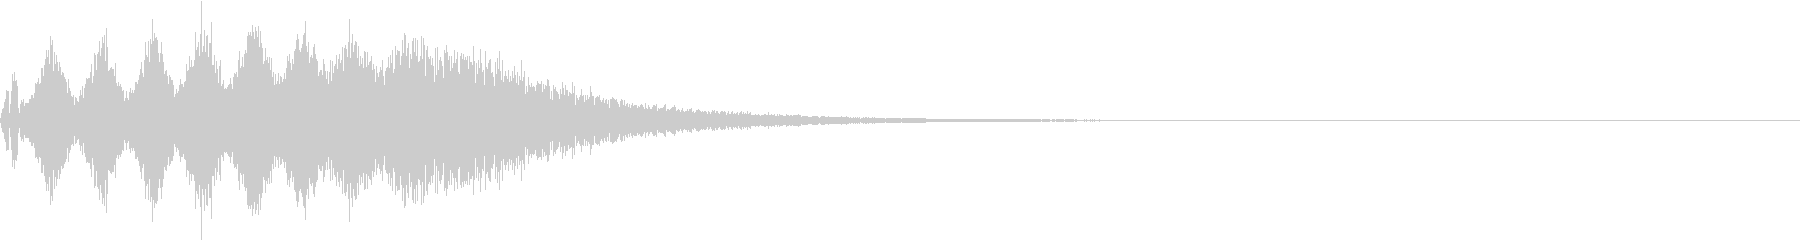 TVFX 目立たせ・アイキャッチ 15の未再生の波形